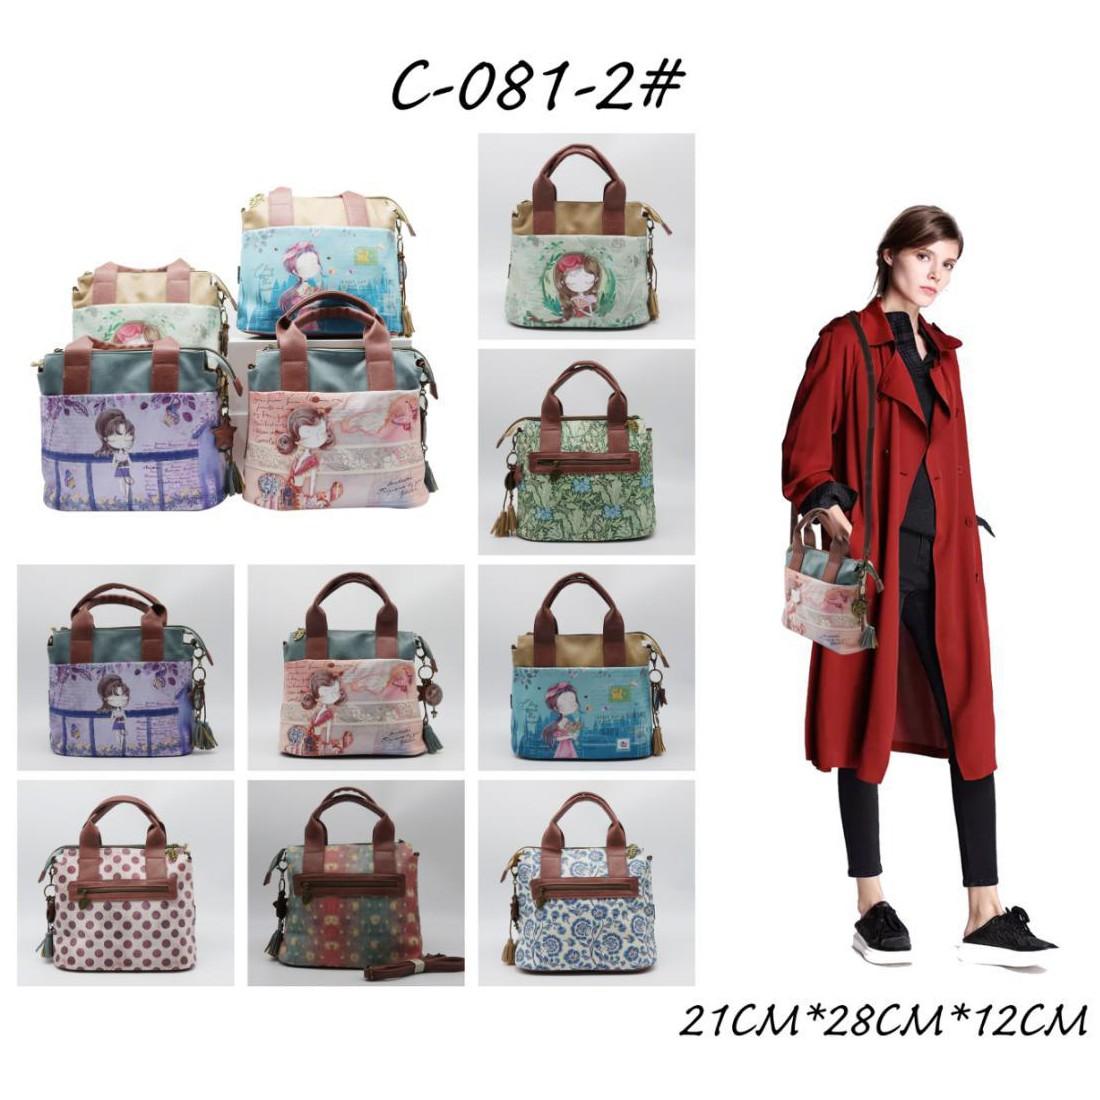 Bolso de mano rectangular Sweet & Candy muñeca C181-2